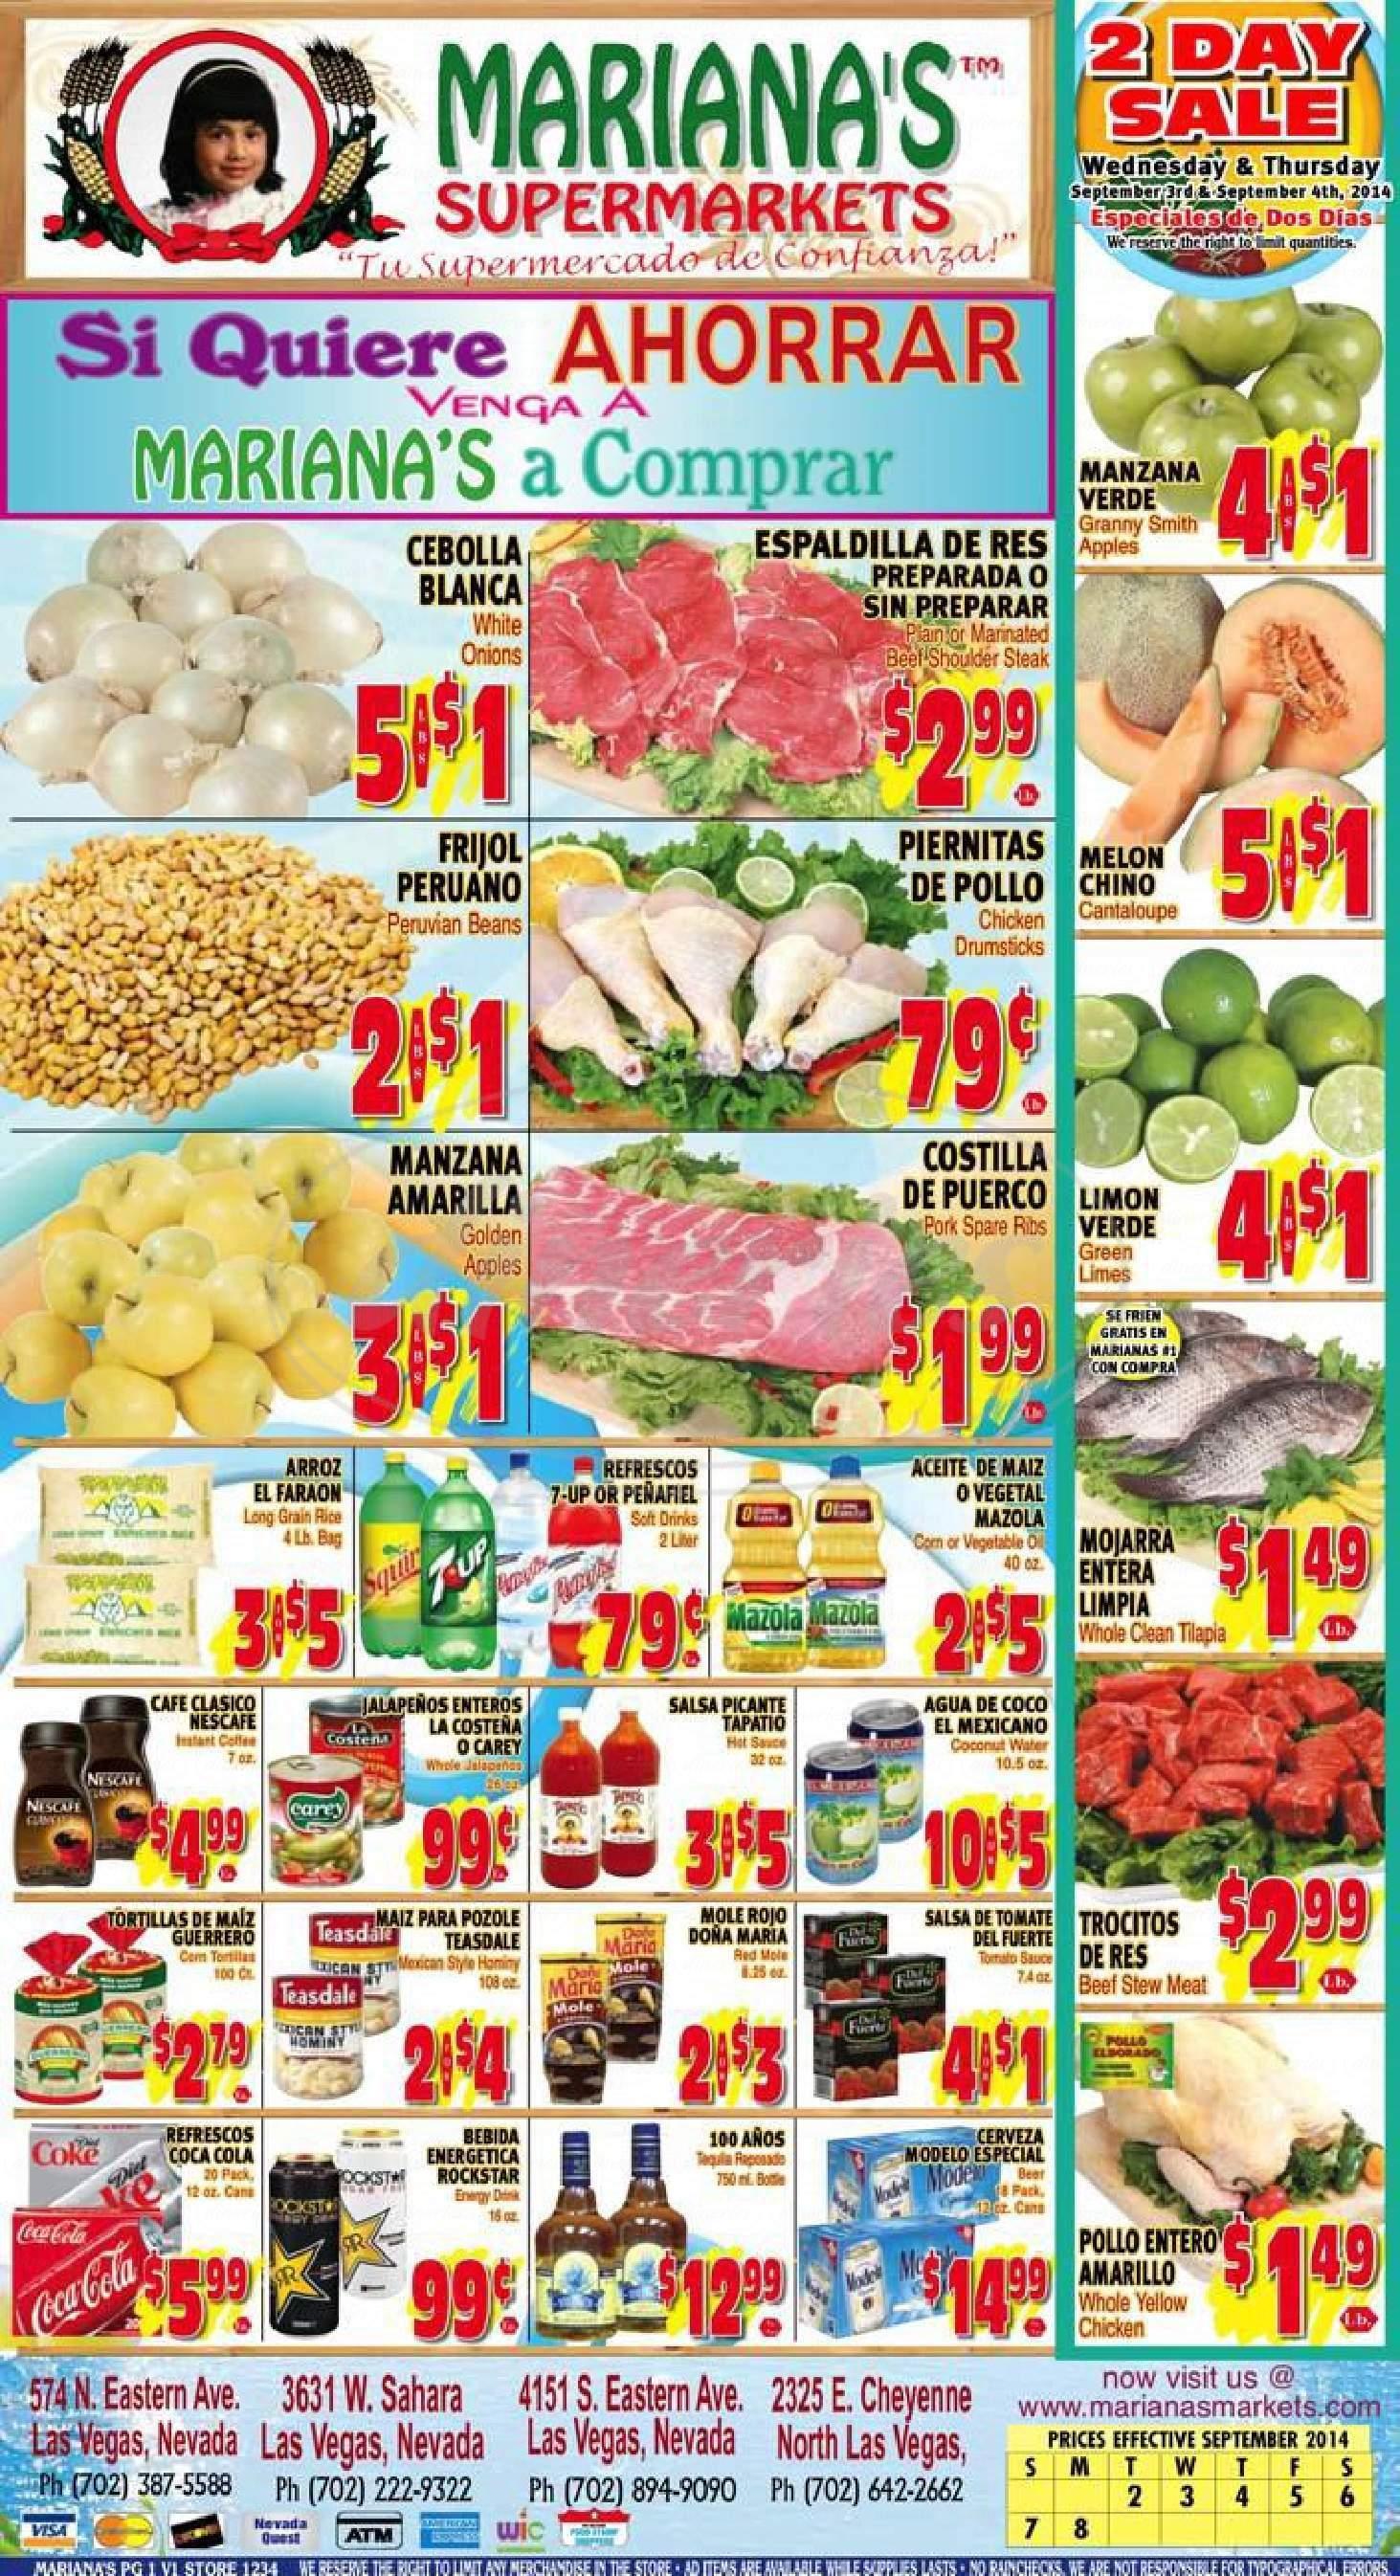 menu for Mariana's Supermarkets